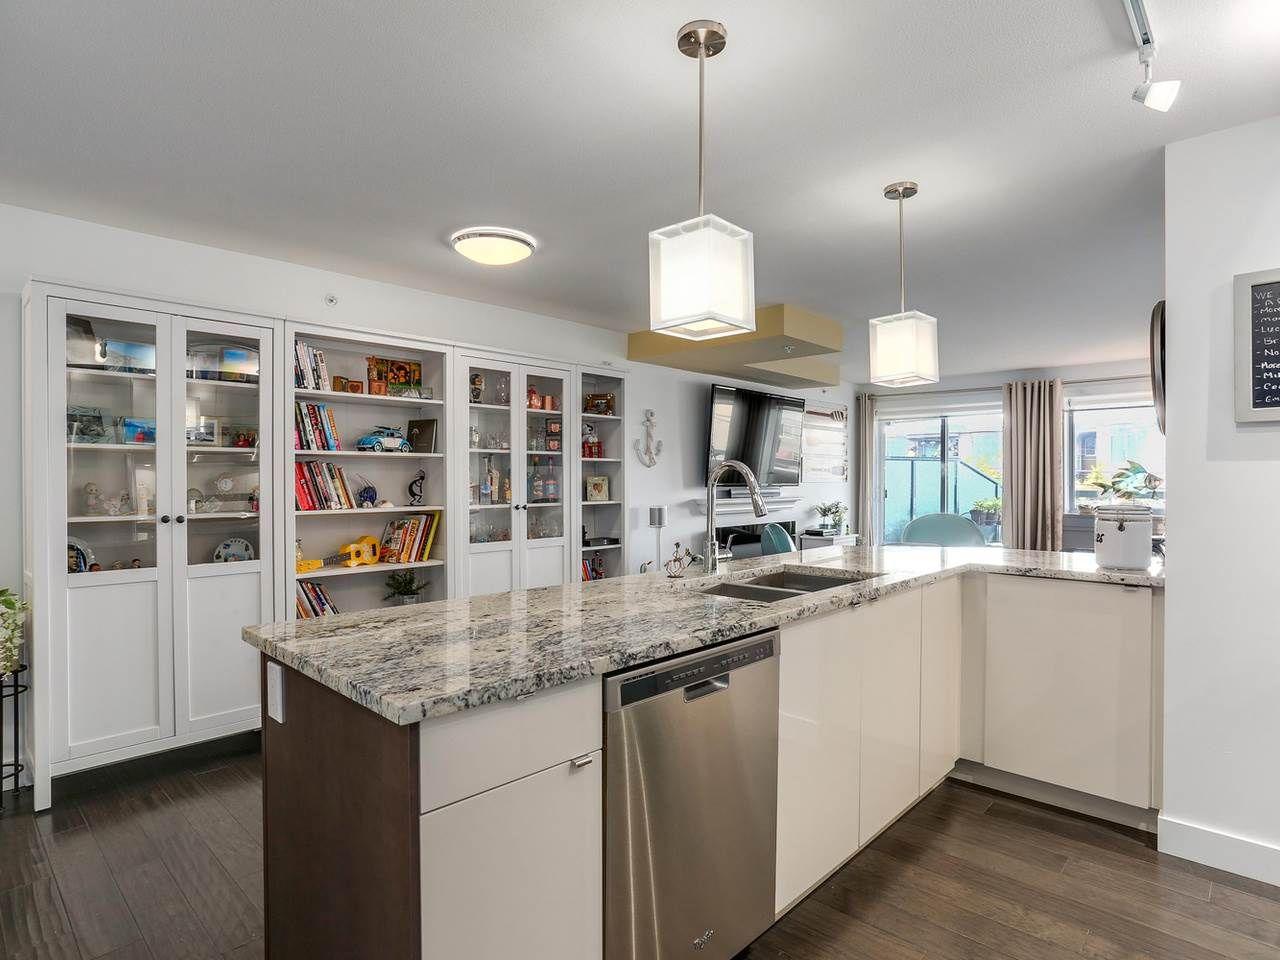 "Photo 9: Photos: 202 14955 VICTORIA Avenue: White Rock Condo for sale in ""SAUSALITO BEACH SIDE LIVING"" (South Surrey White Rock)  : MLS®# R2128764"